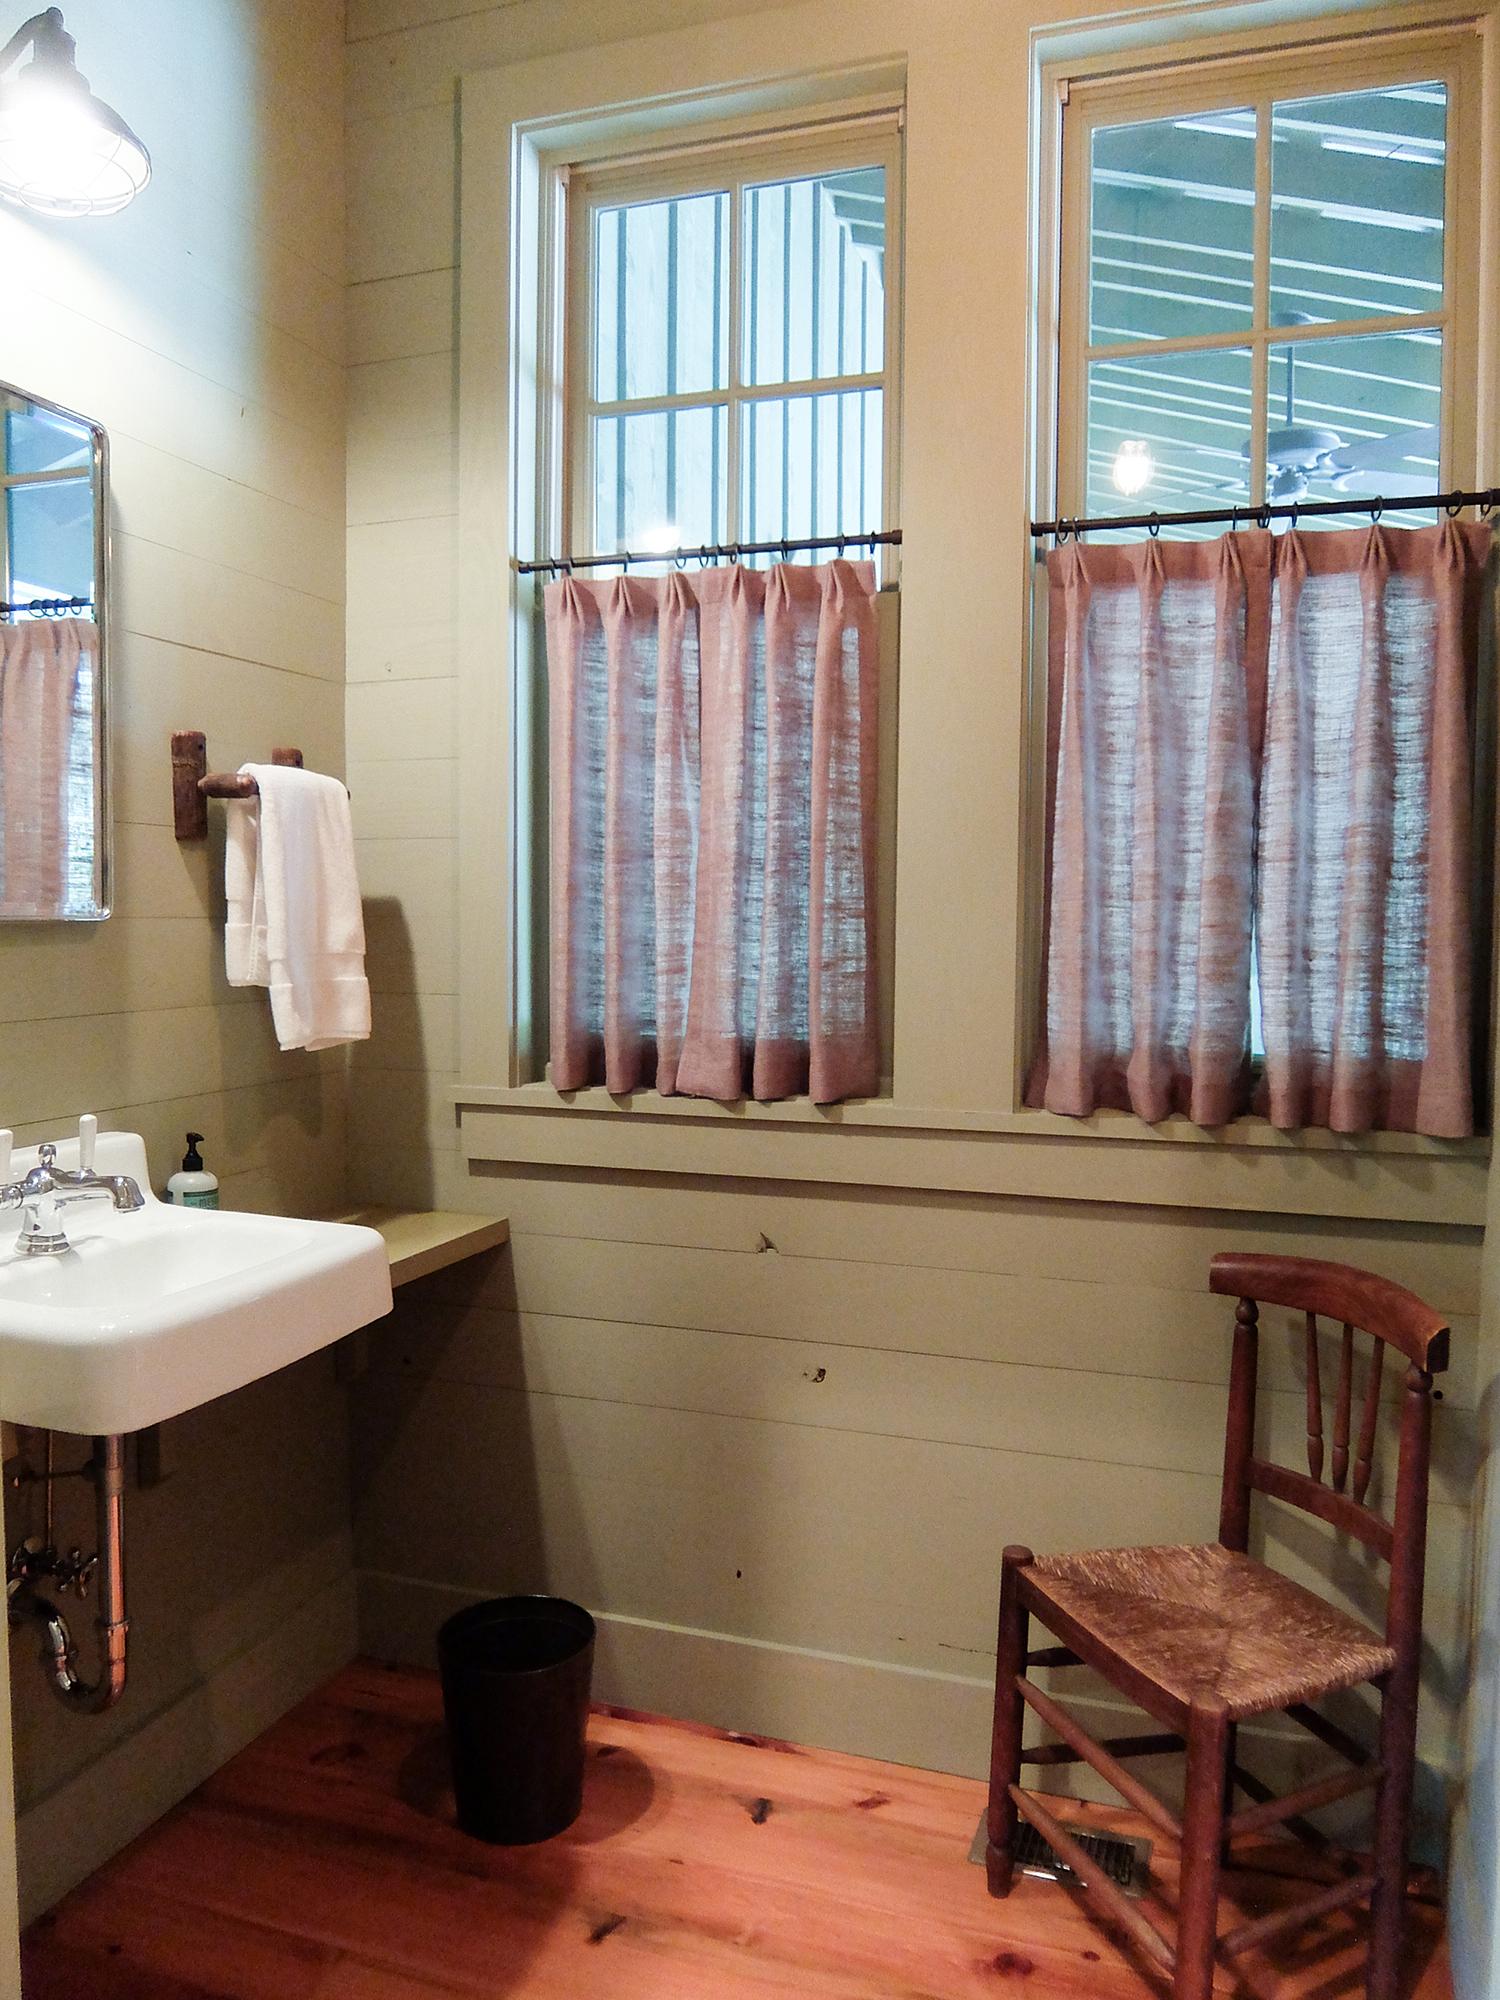 sugar_creek_farm_33_lakehouse_lake_house_bathroom_vanity_dressing_room_farmhouse_1500.jpg